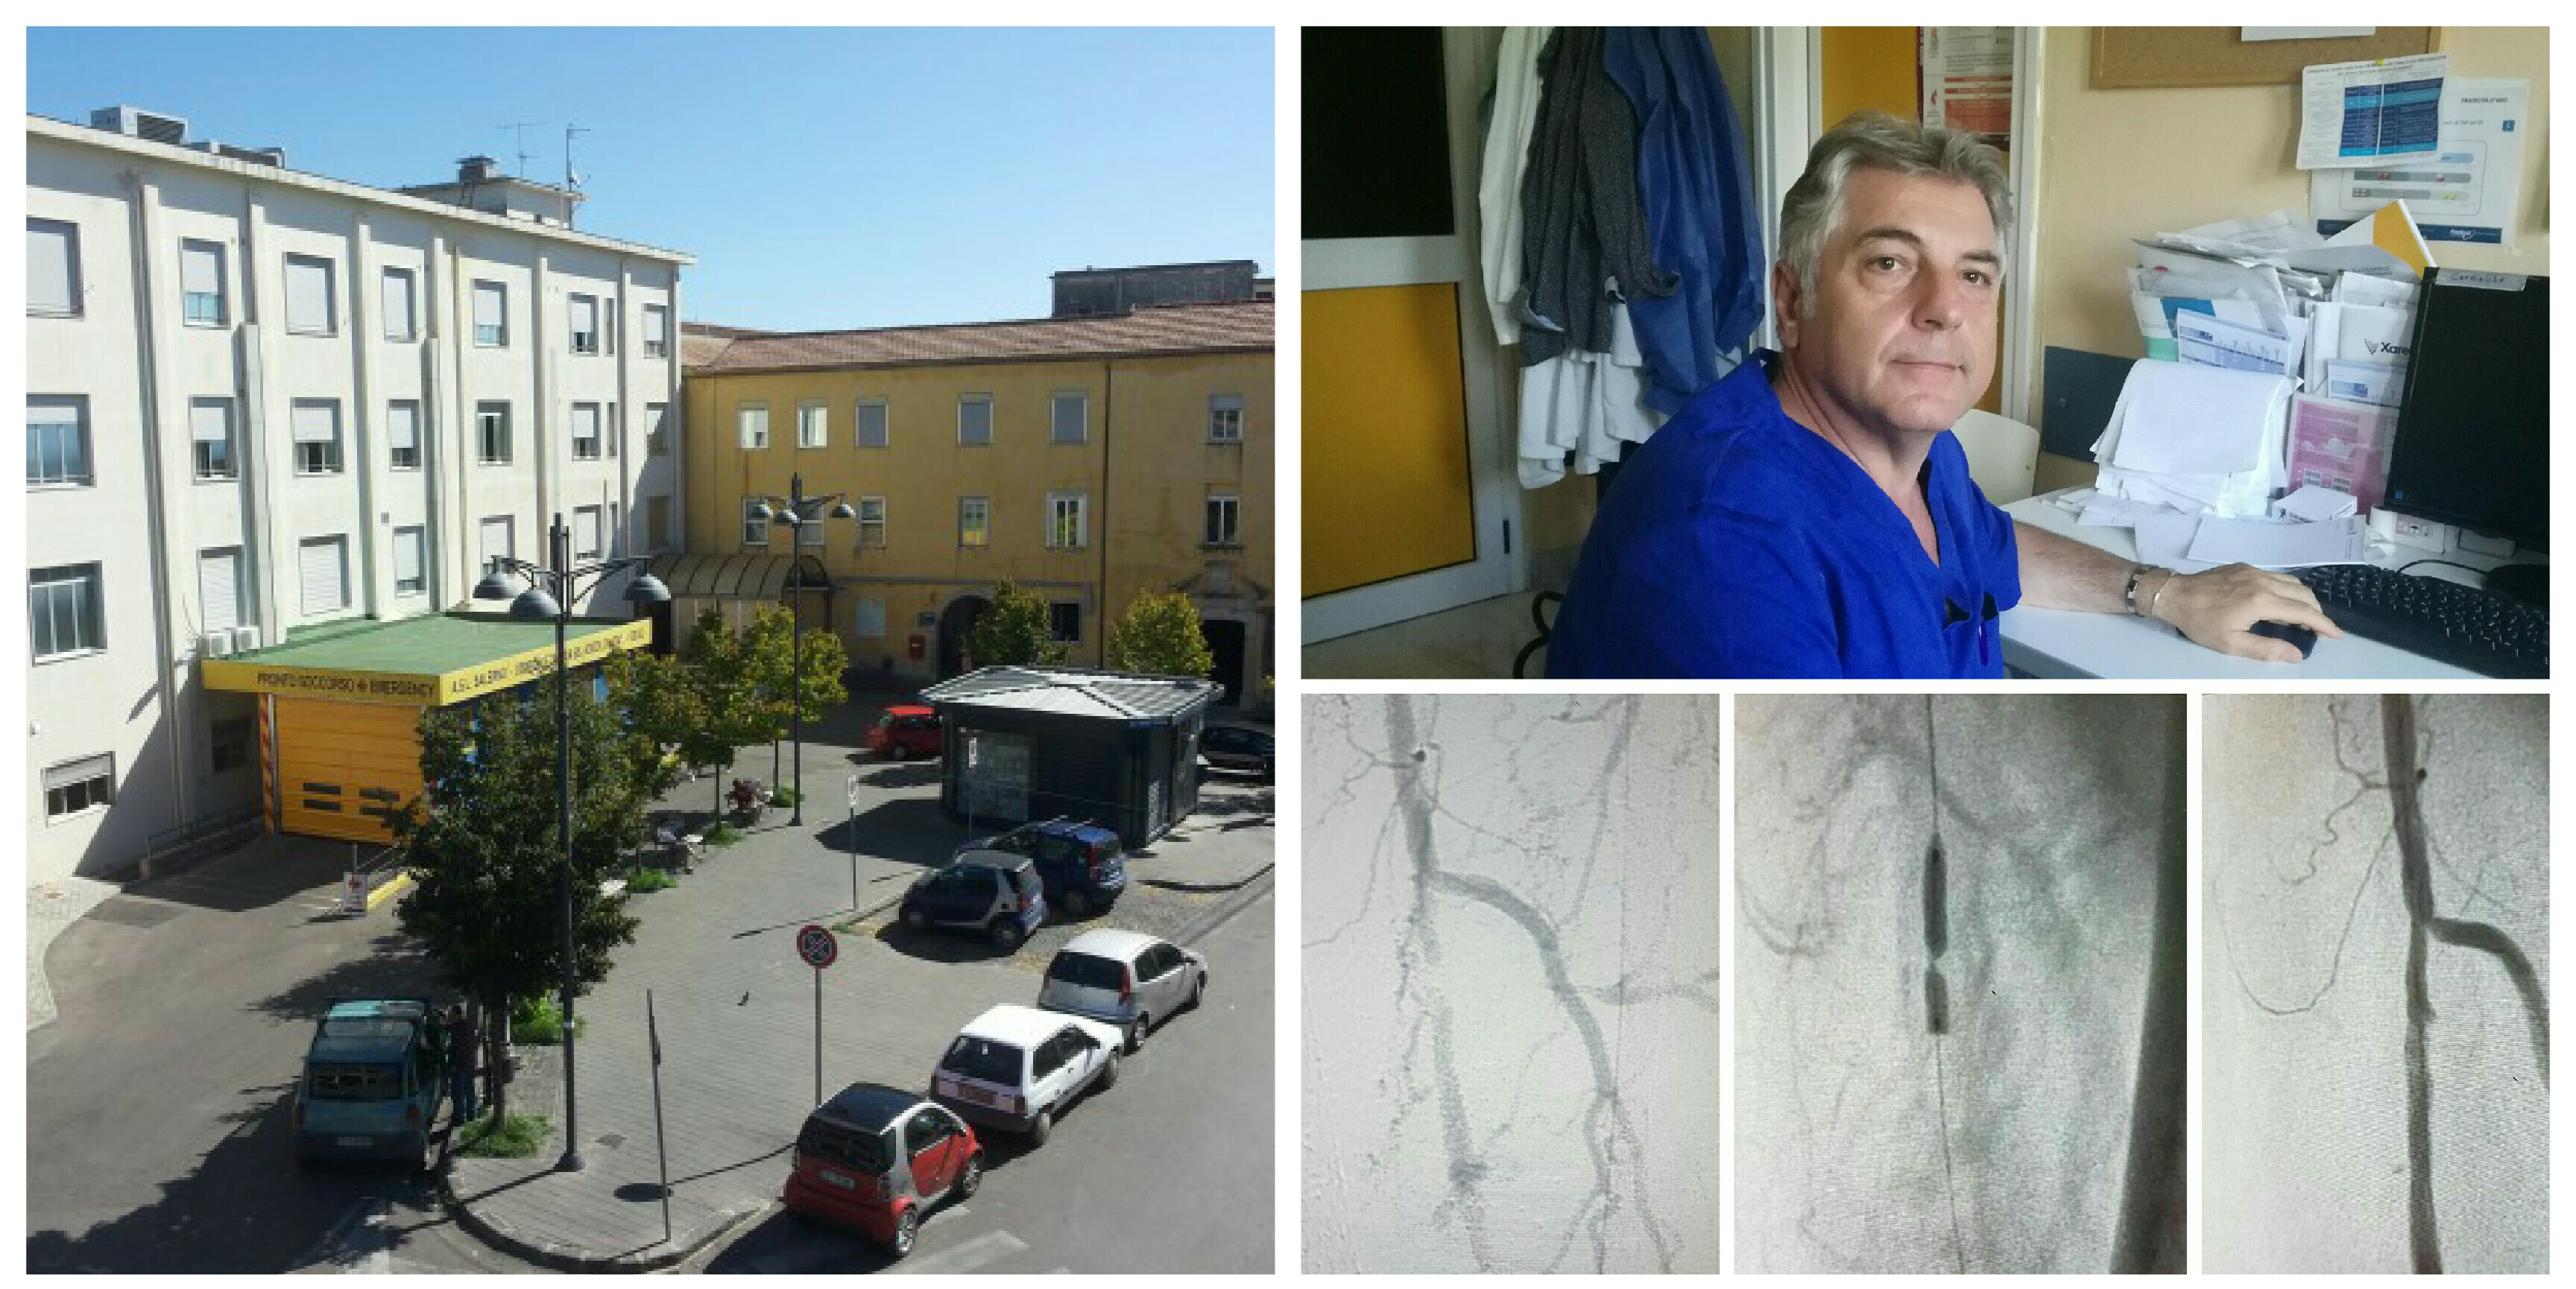 Ospedale Eboli-Giuseppe Bottiglieri-arteria-prima-durante-dopo-intervento